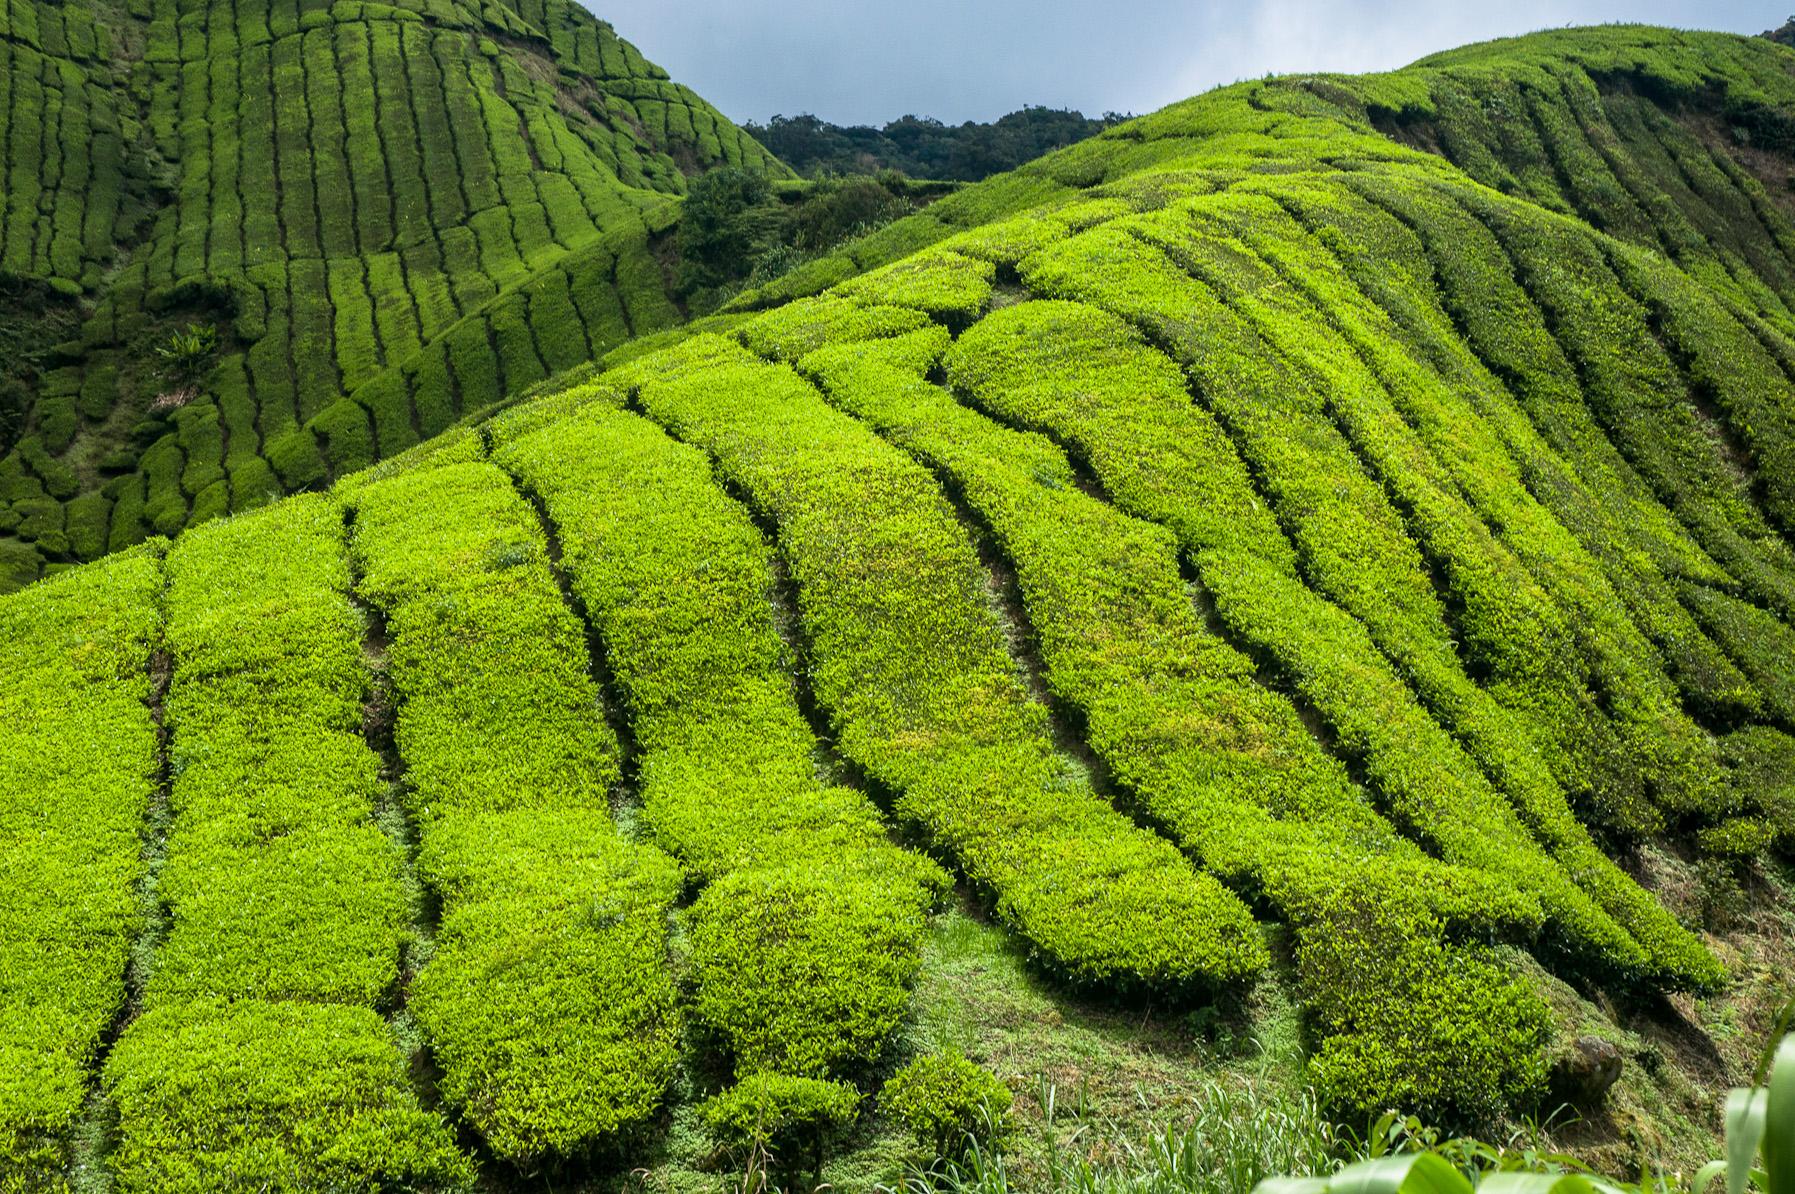 Pola herbaciane